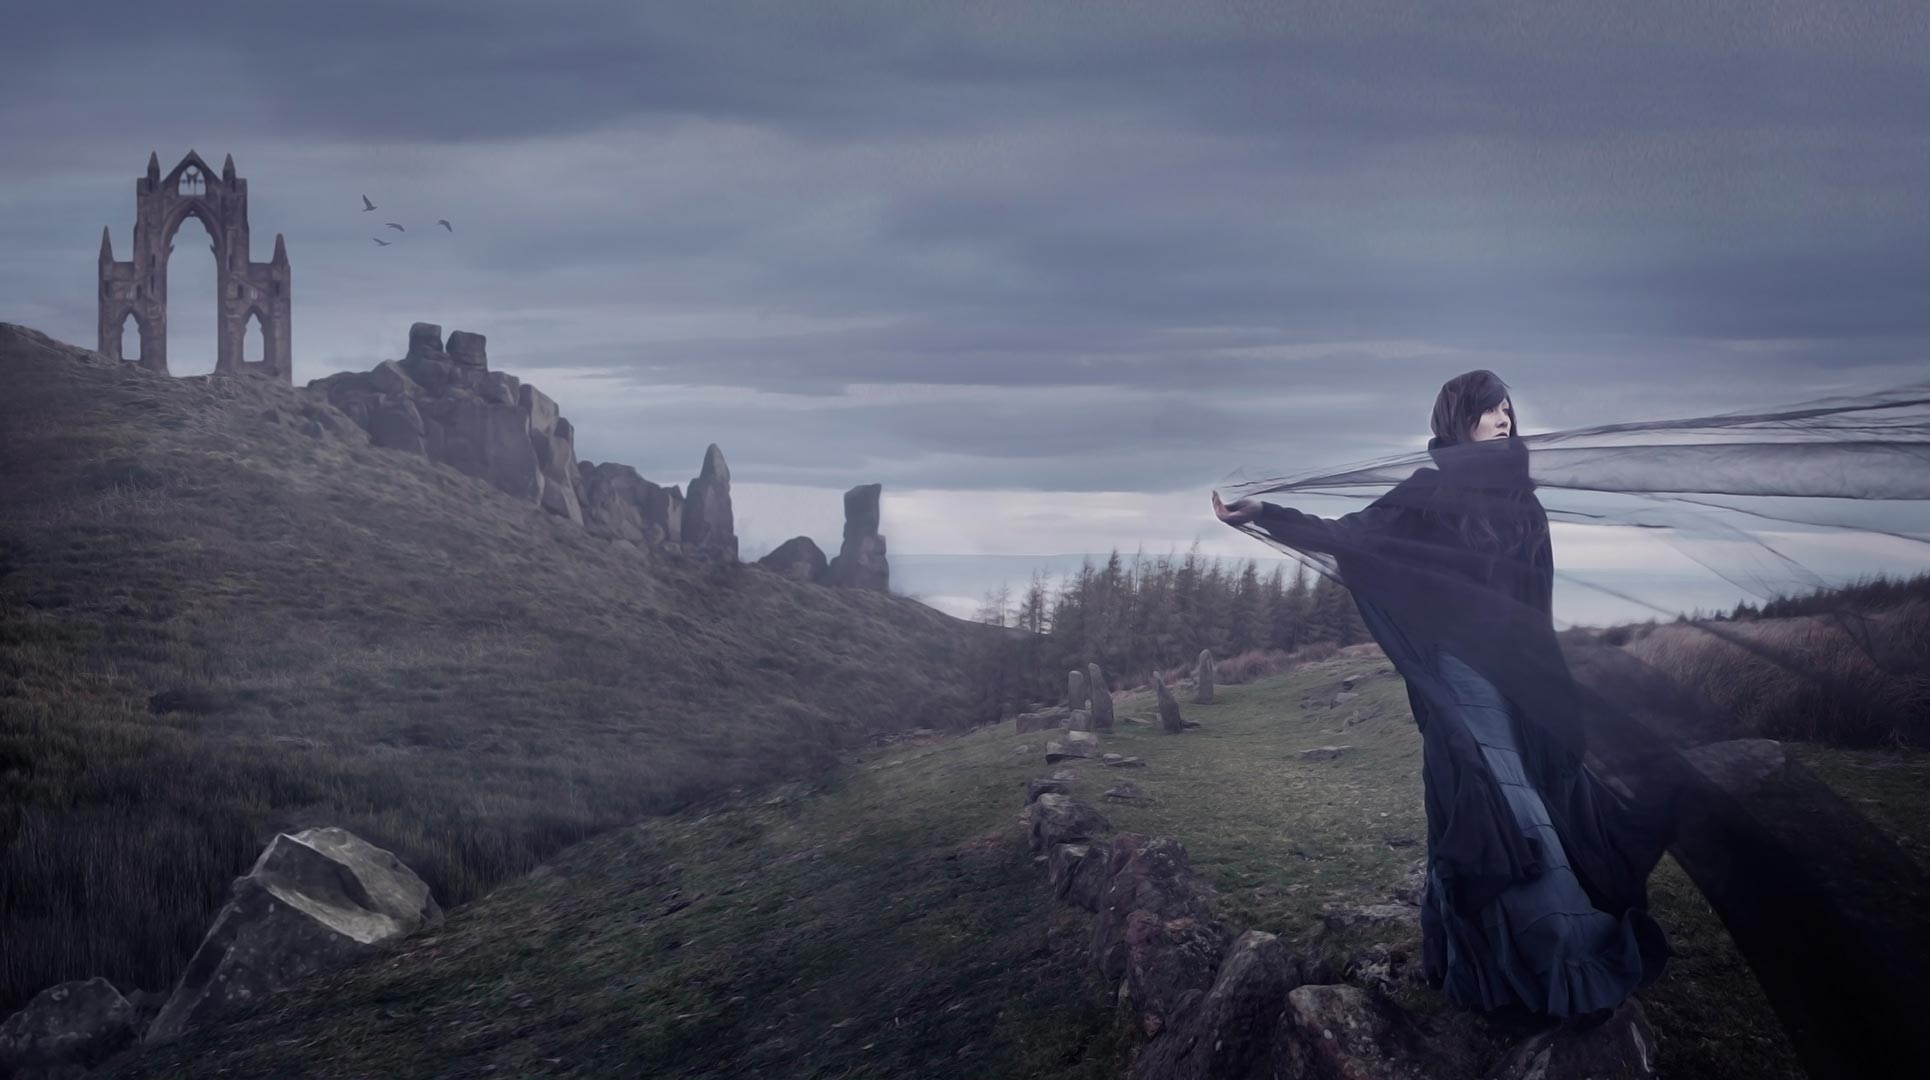 Nicola_Taylor_Art_Photography_Falling_Into_Ruin_1